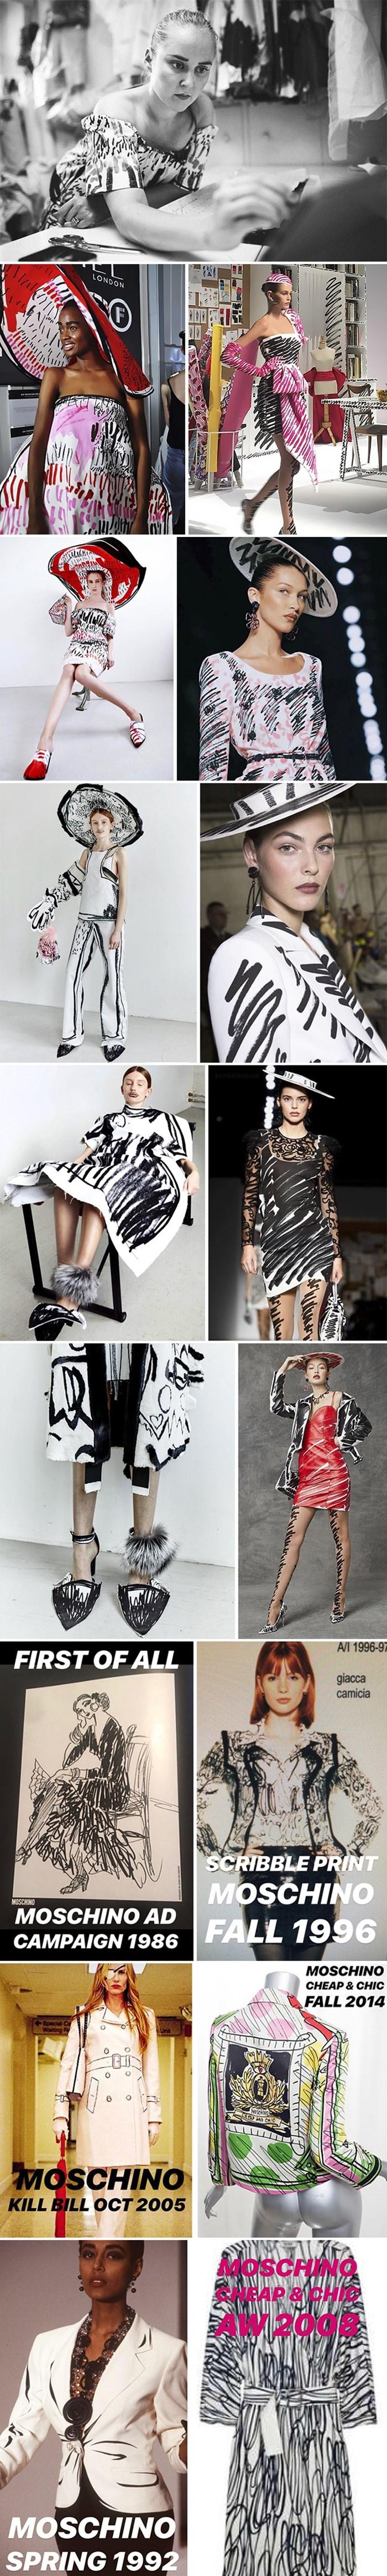 Mlada dizajnerica optužila poznati modni brend da su je totalno iskopirali, slike govore dovoljno o njenoj tvrdnji